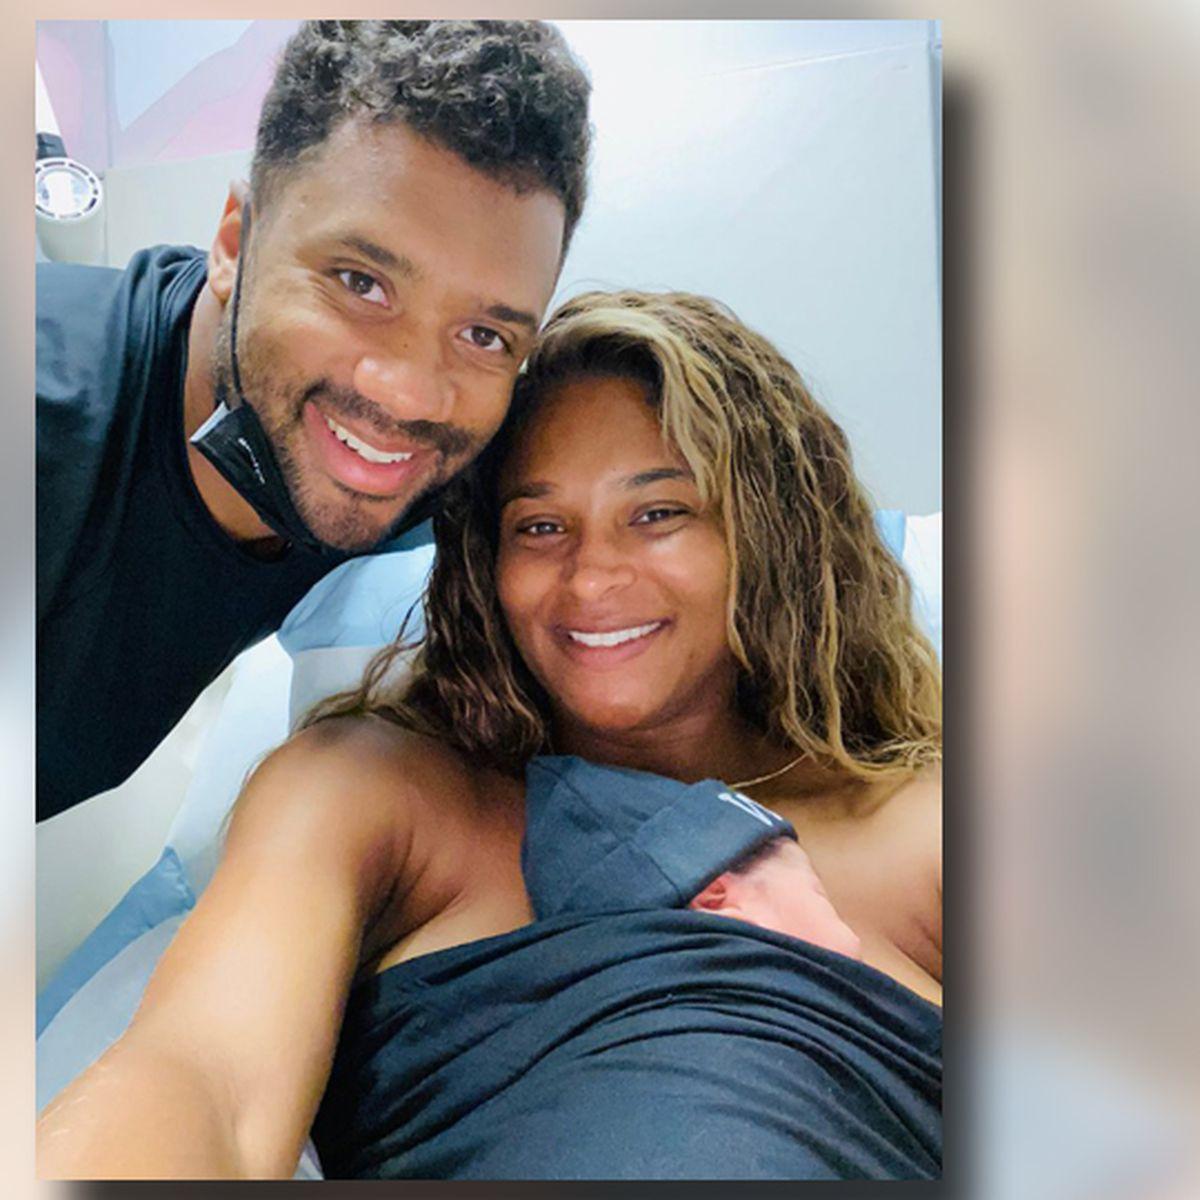 Seahawks Qb Russell Wilson Wife Ciara Welcome Baby Boy